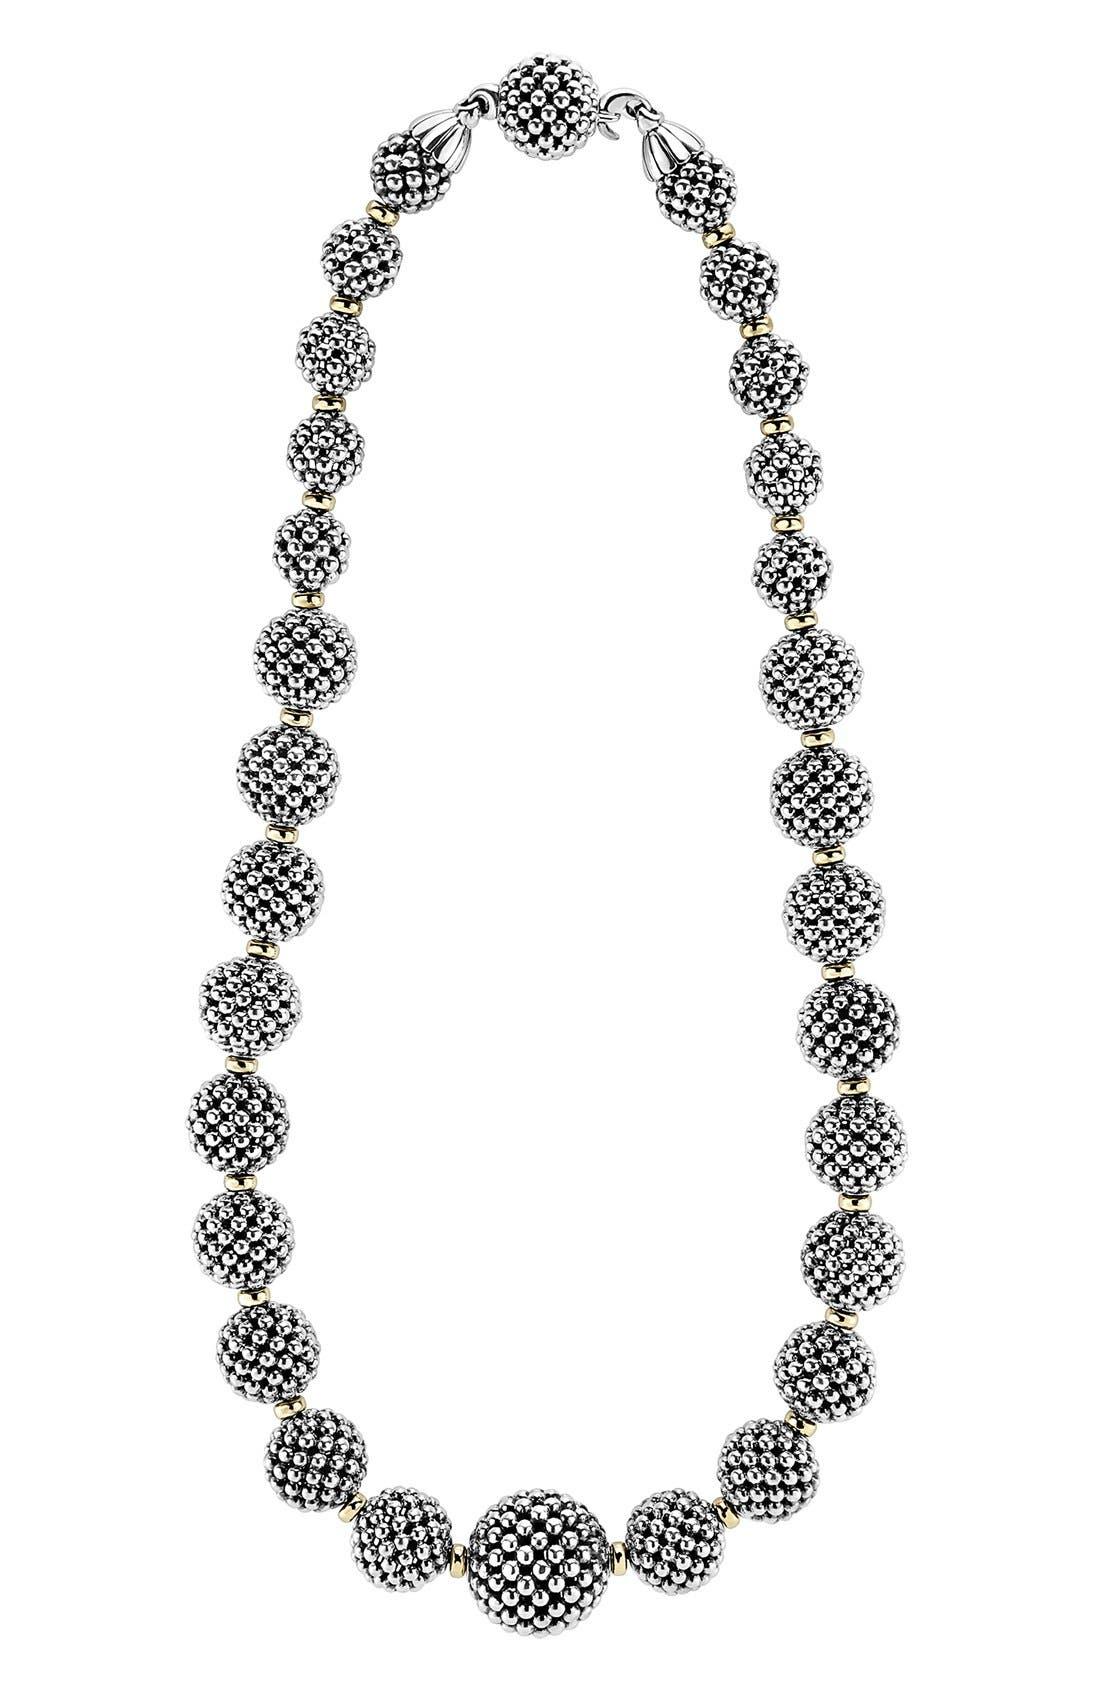 LAGOS 'Caviar Forever' Lattice Ball Necklace